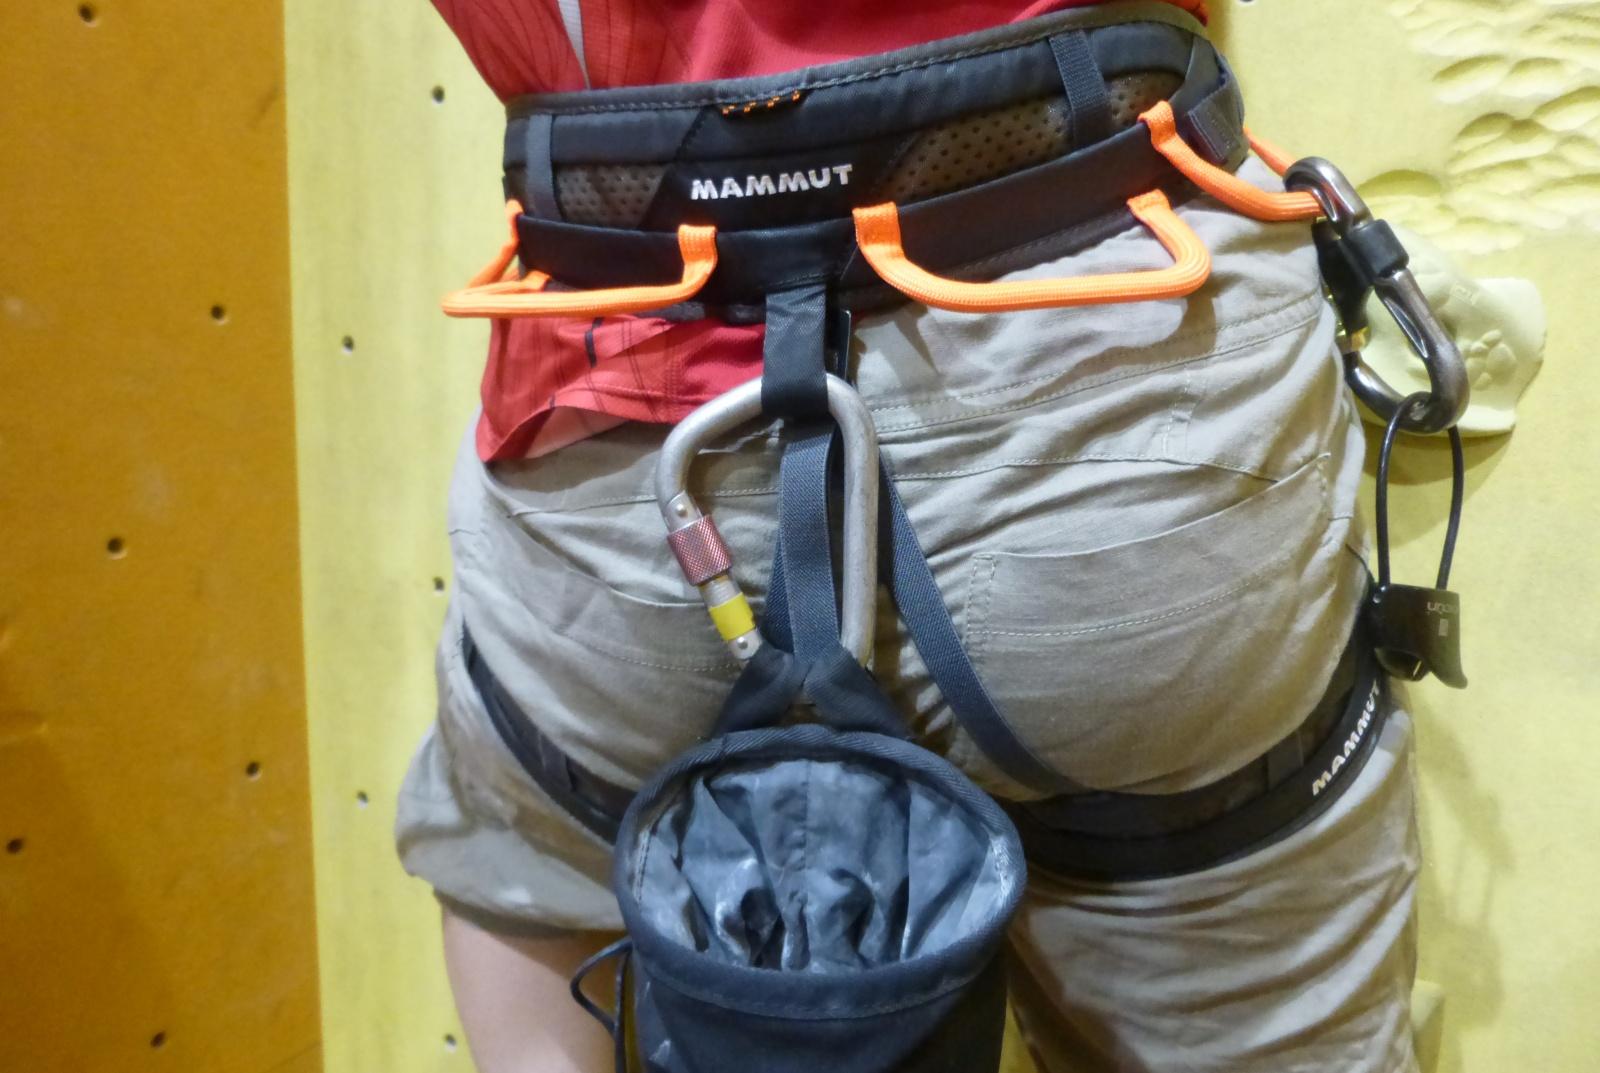 Klettergurt Mammut Ophir : Test klettergurt ophir slide von mammut modell